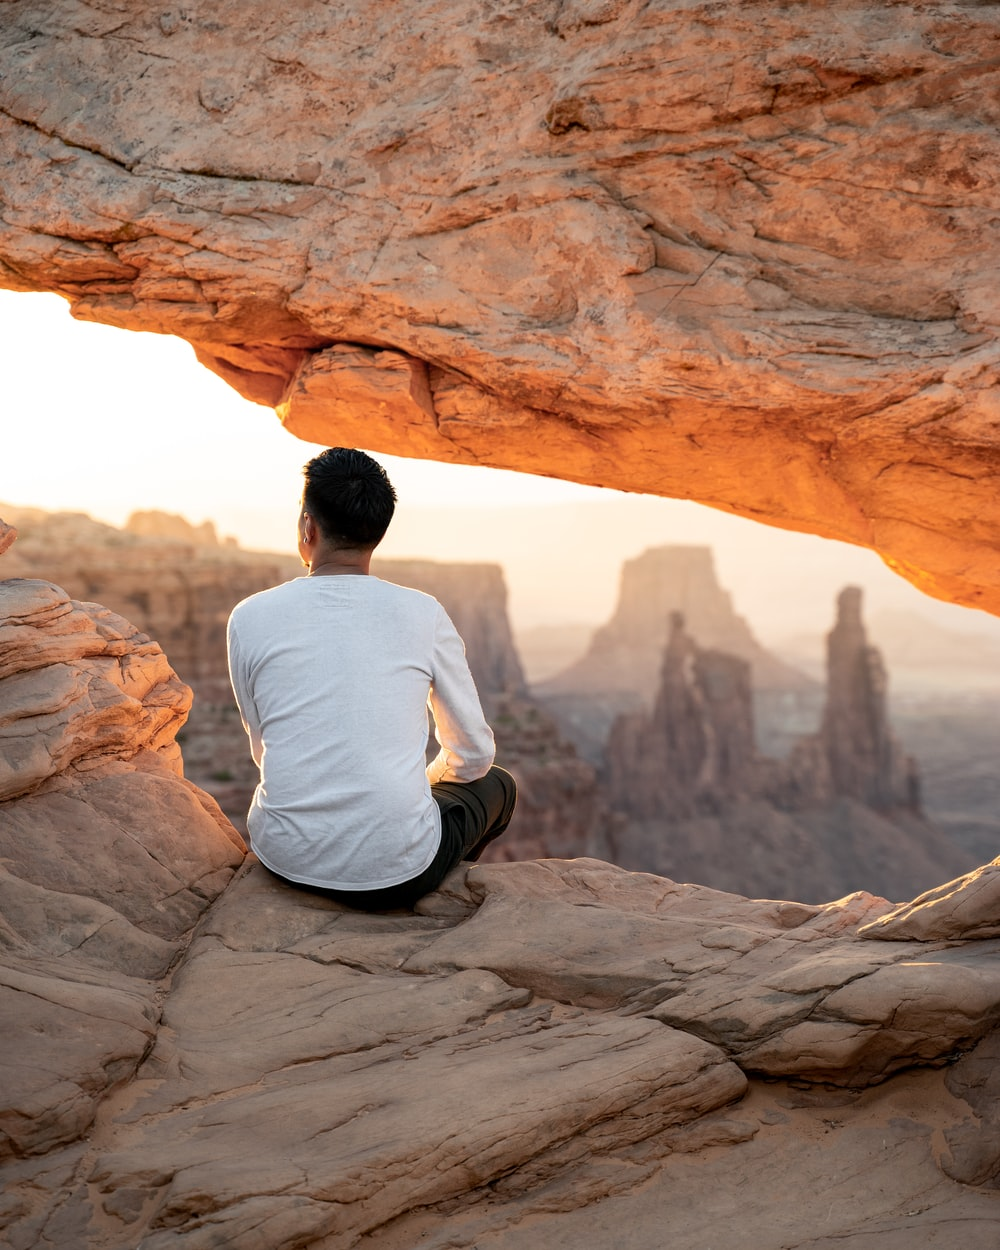 man in white shirt sitting on brown rock formation during daytime